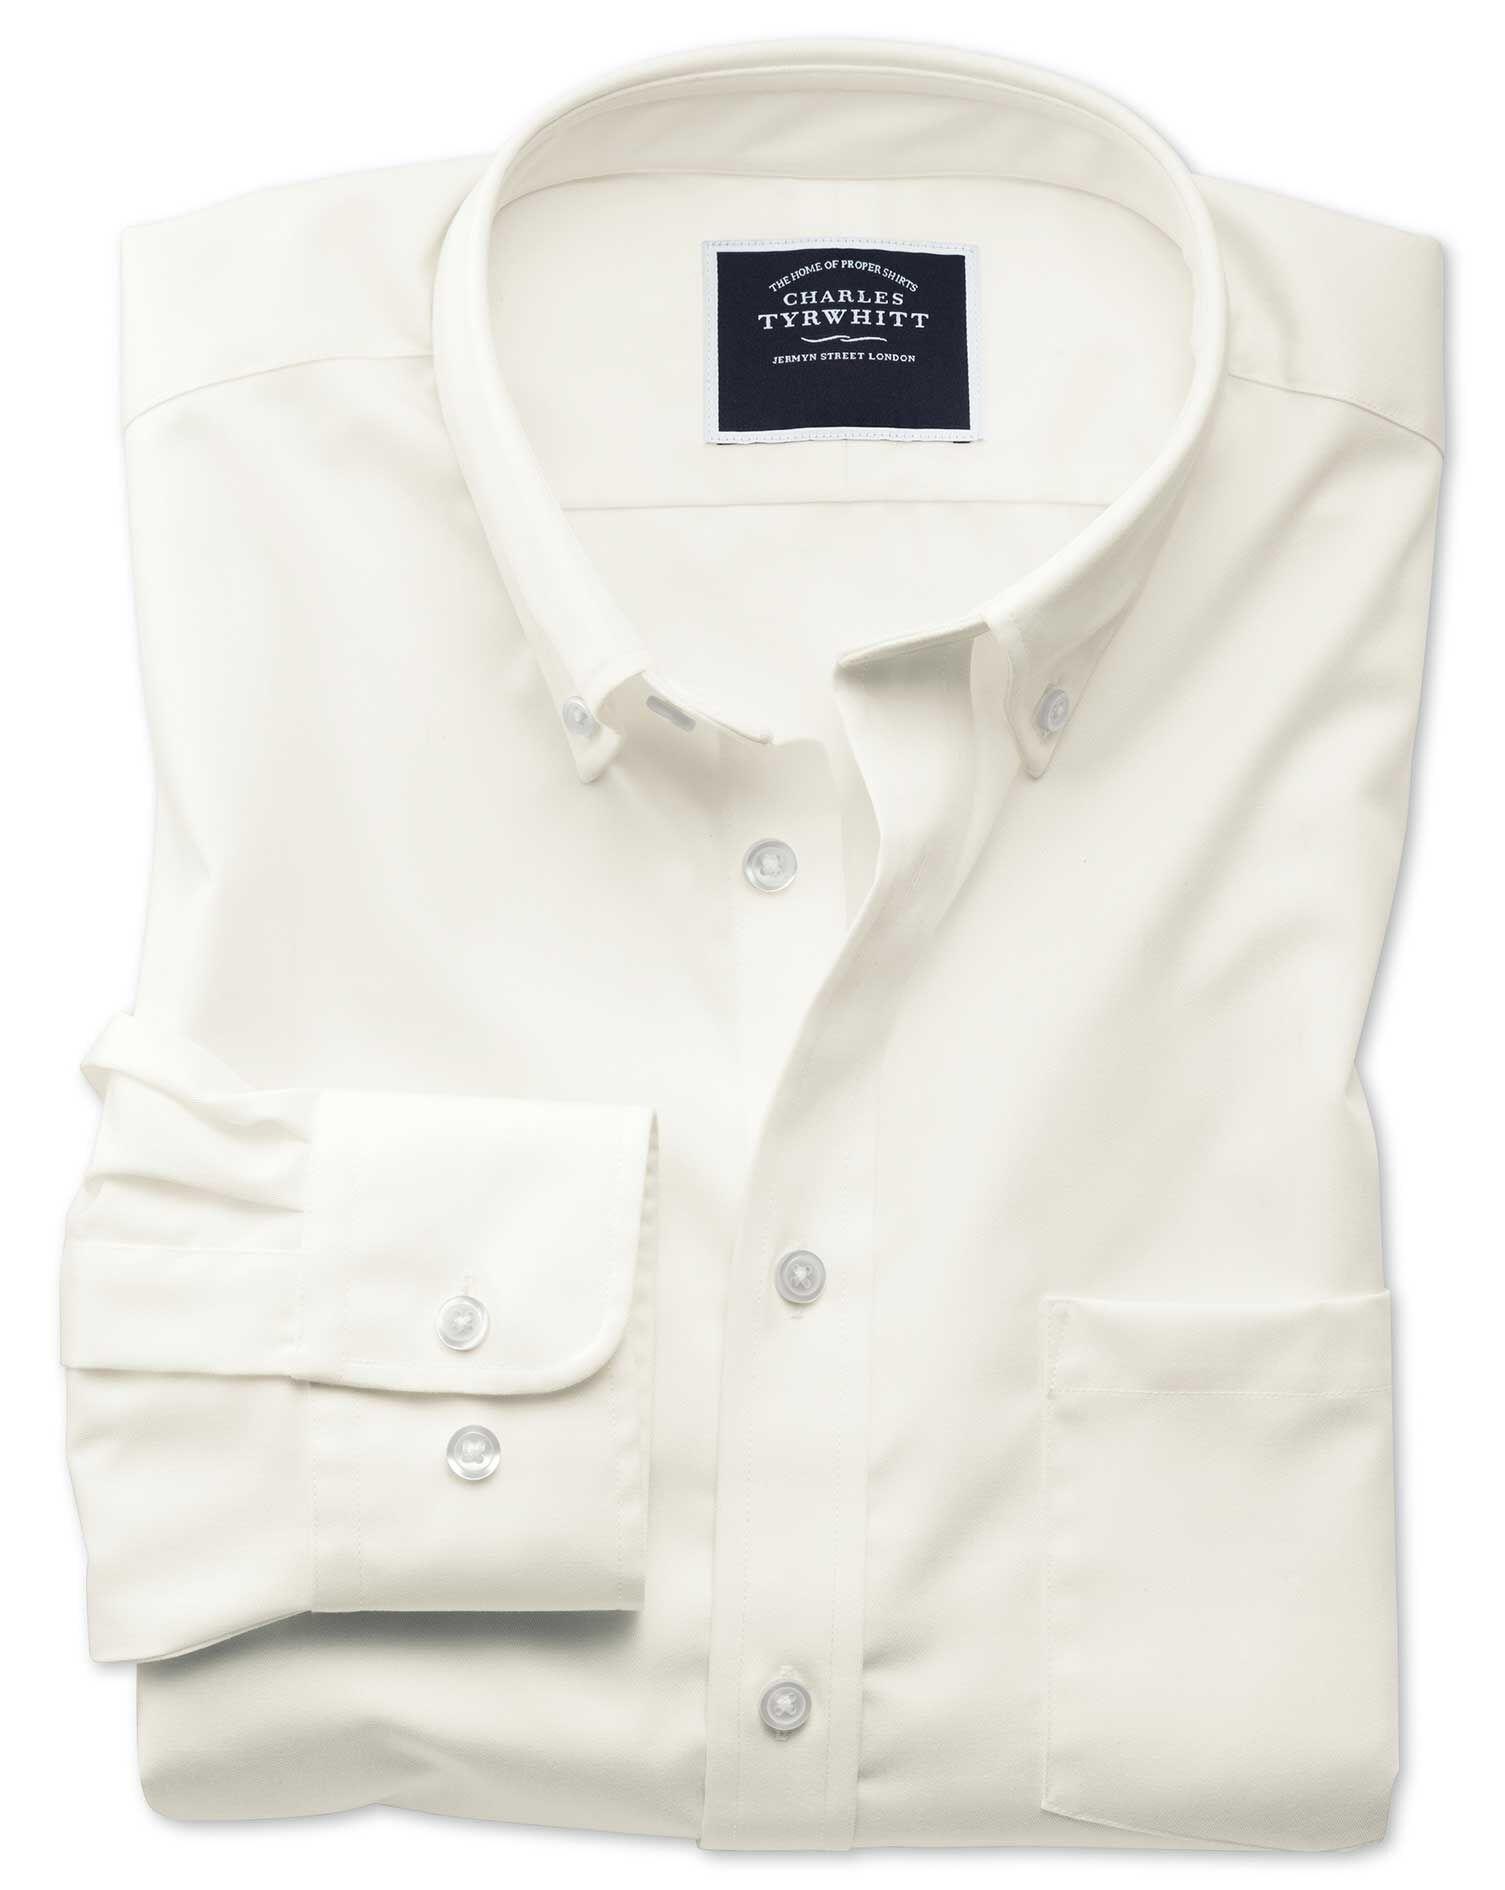 Slim Fit Non-Iron Twill Off-White Cotton Shirt Single Cuff Size XS by Charles Tyrwhitt